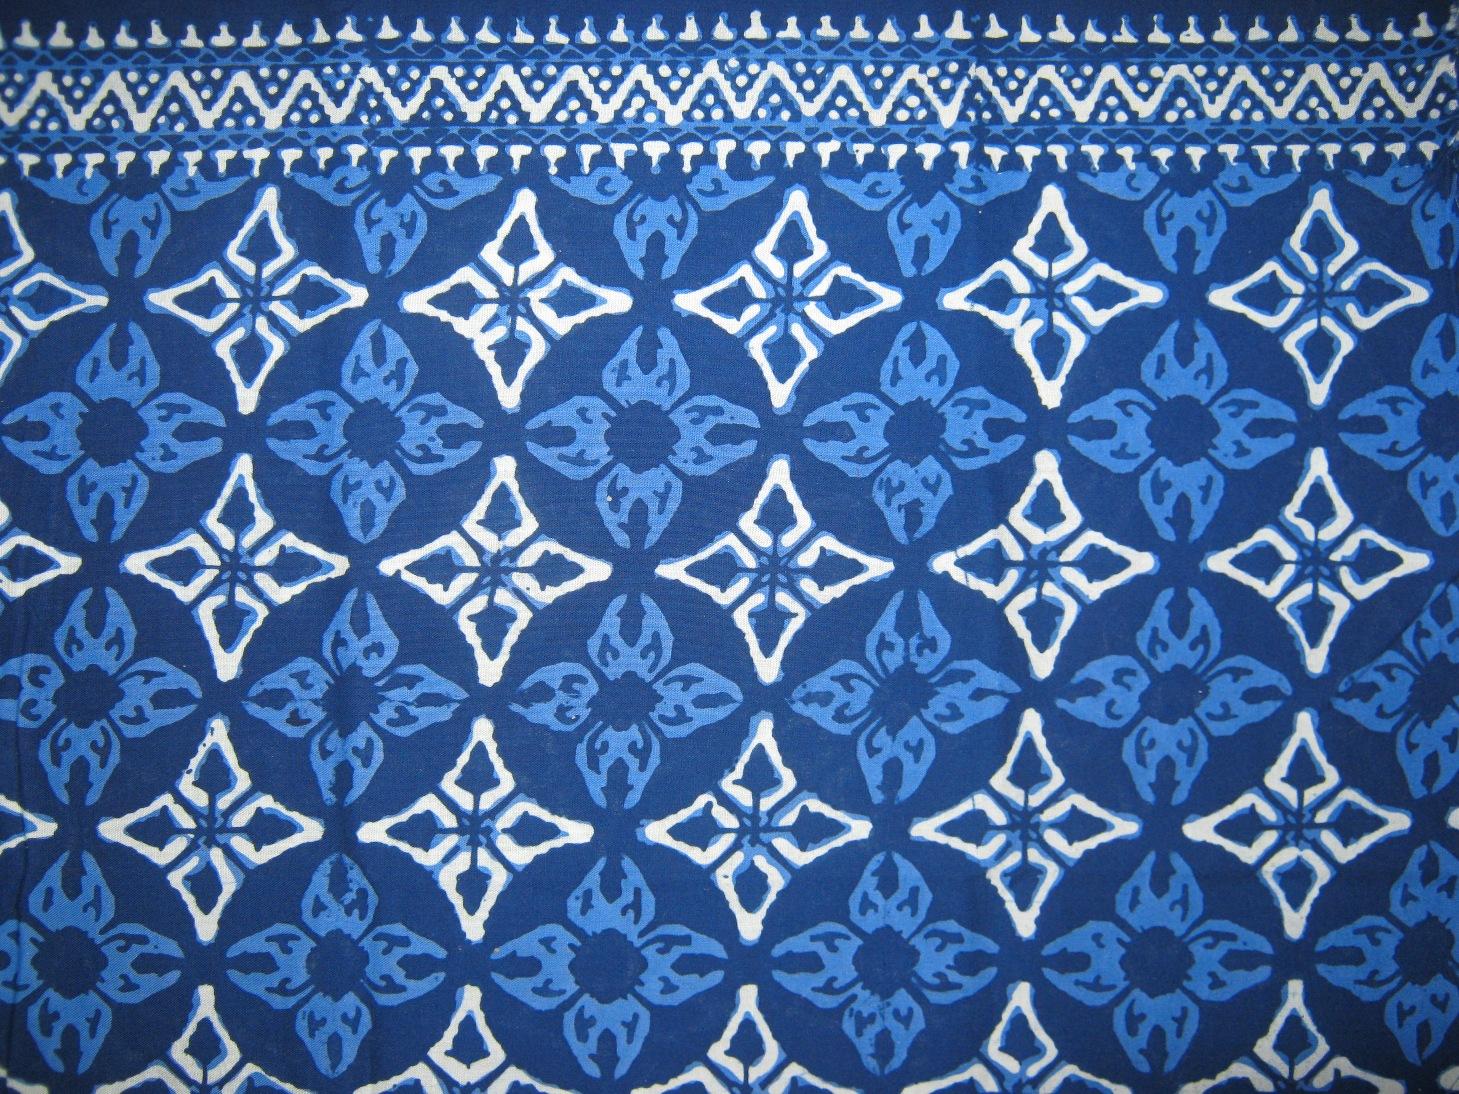 ini batik mengalami perkembangan yang pesat bahkan gambar motif batik ...